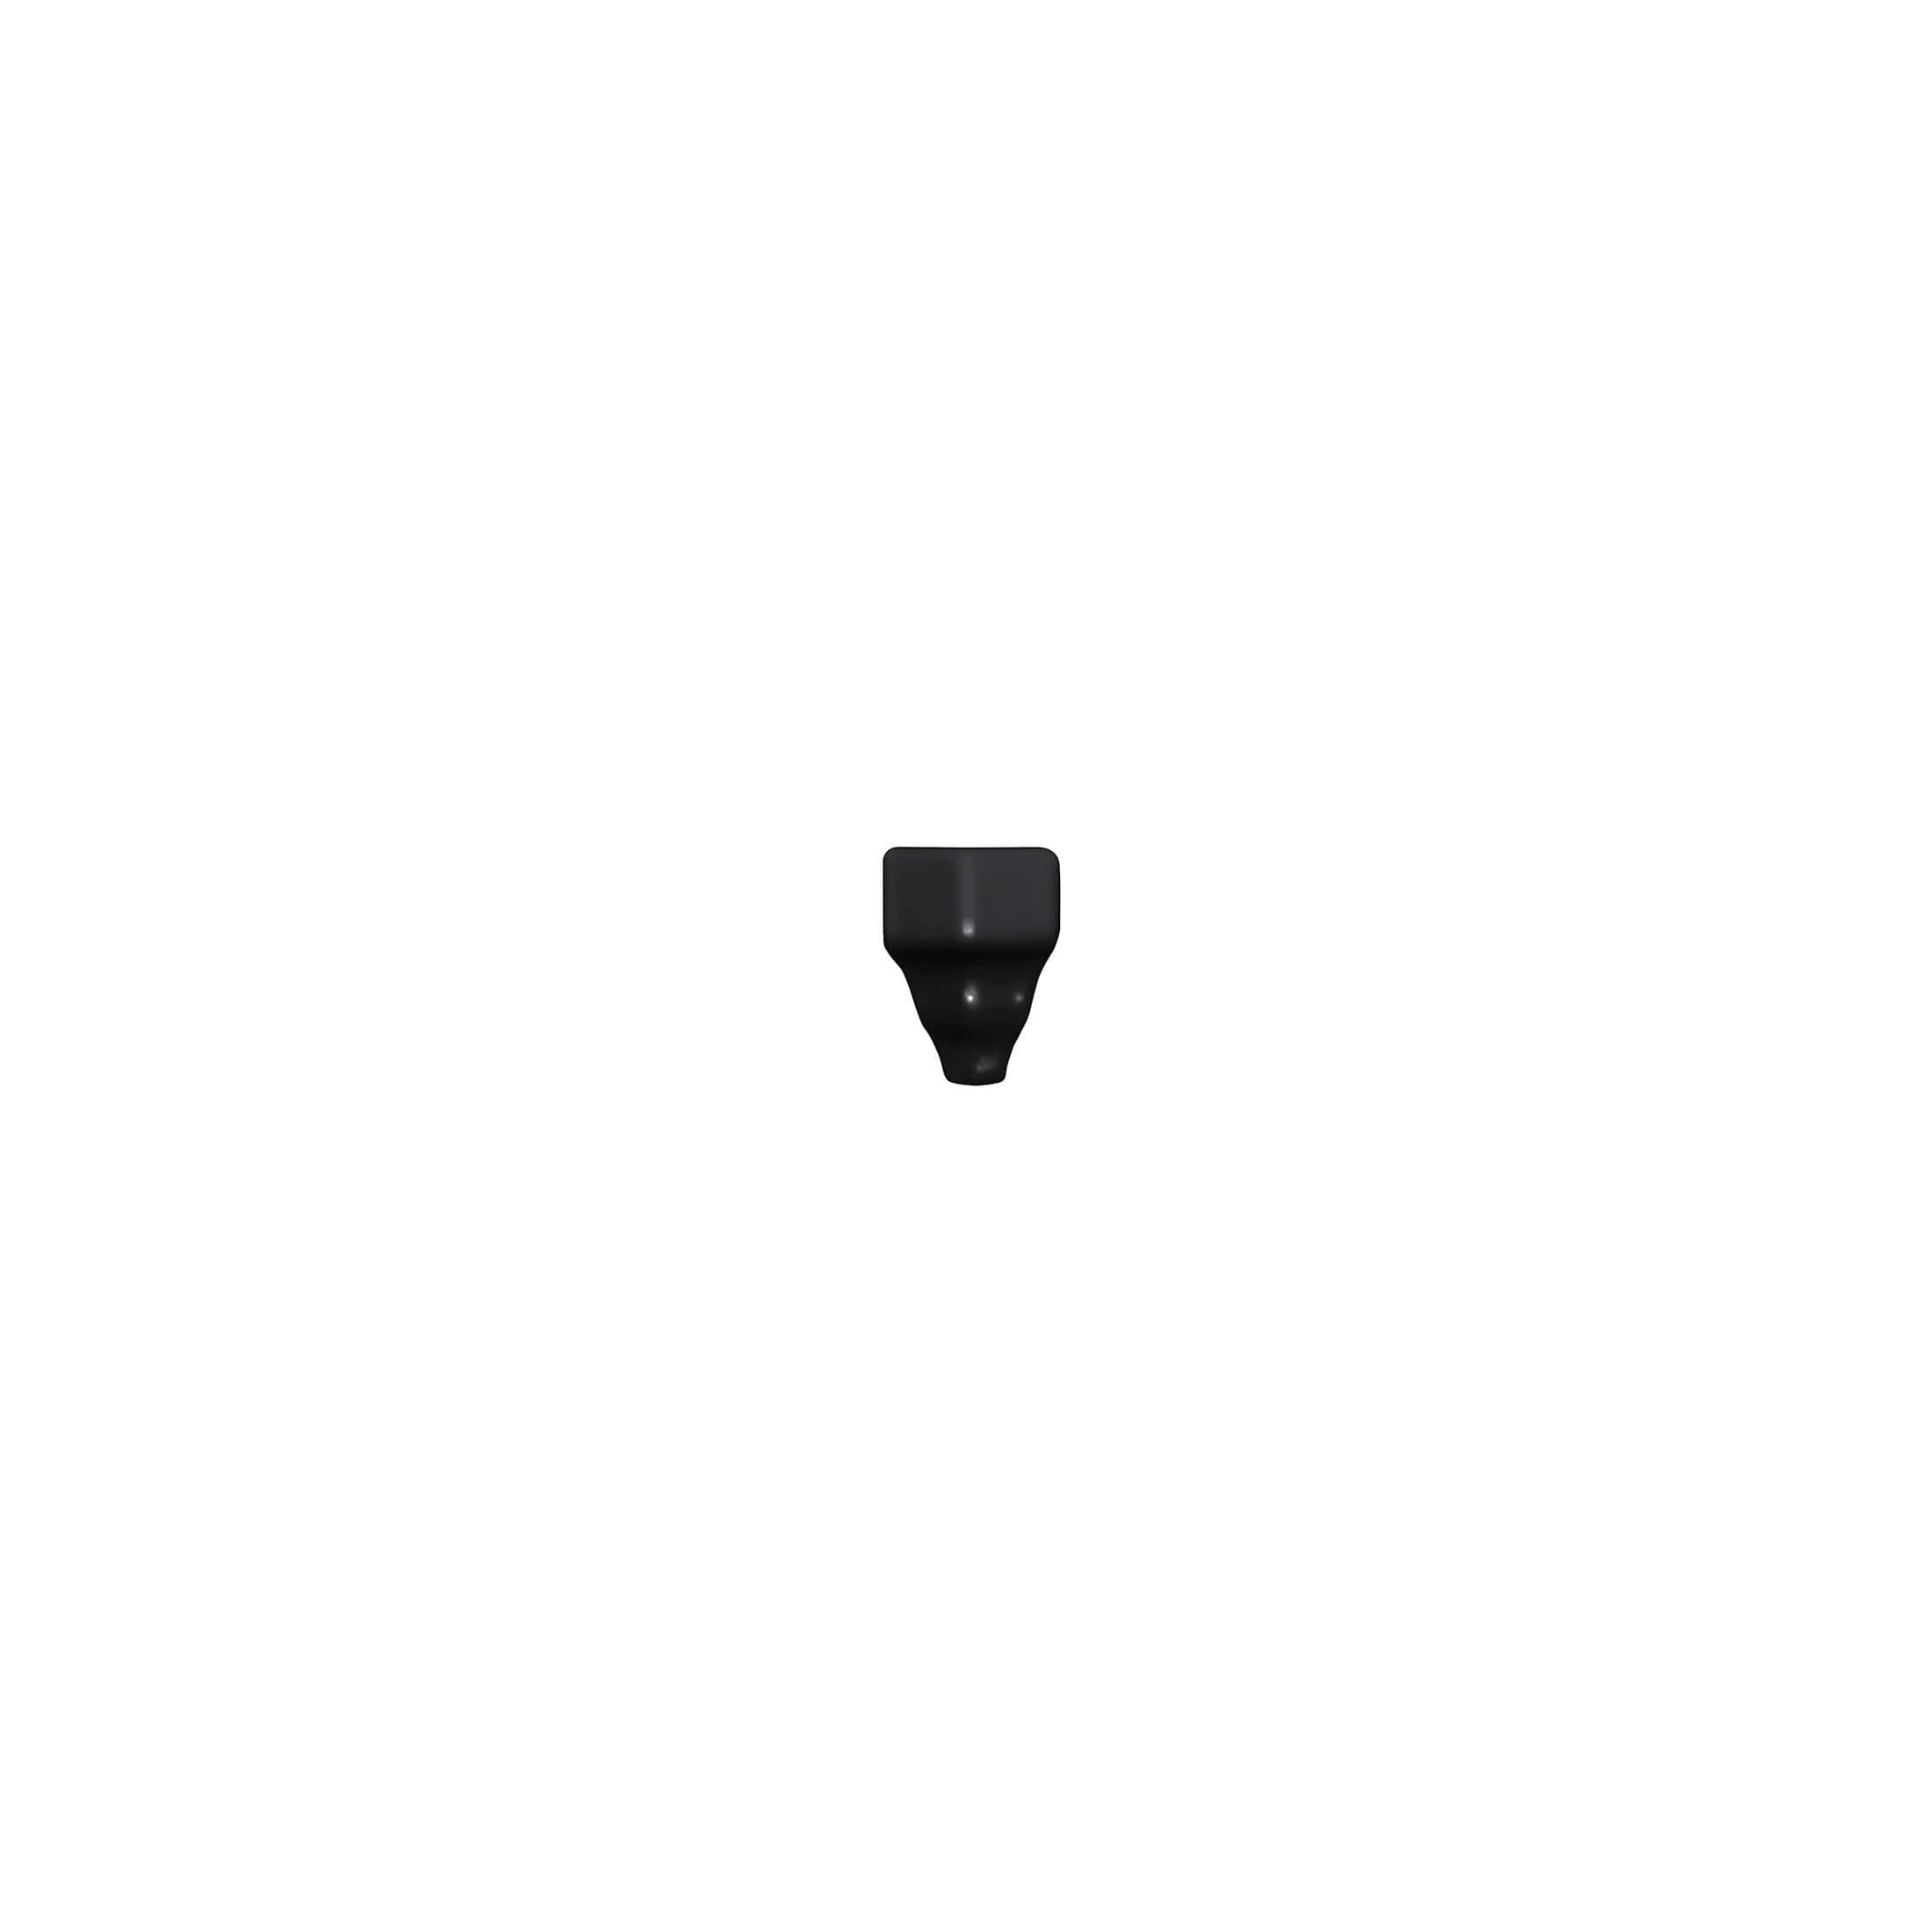 ADNE5441 - ANGULO EXTERIOR CORNISACLASICA - 3.5 cm X 15 cm